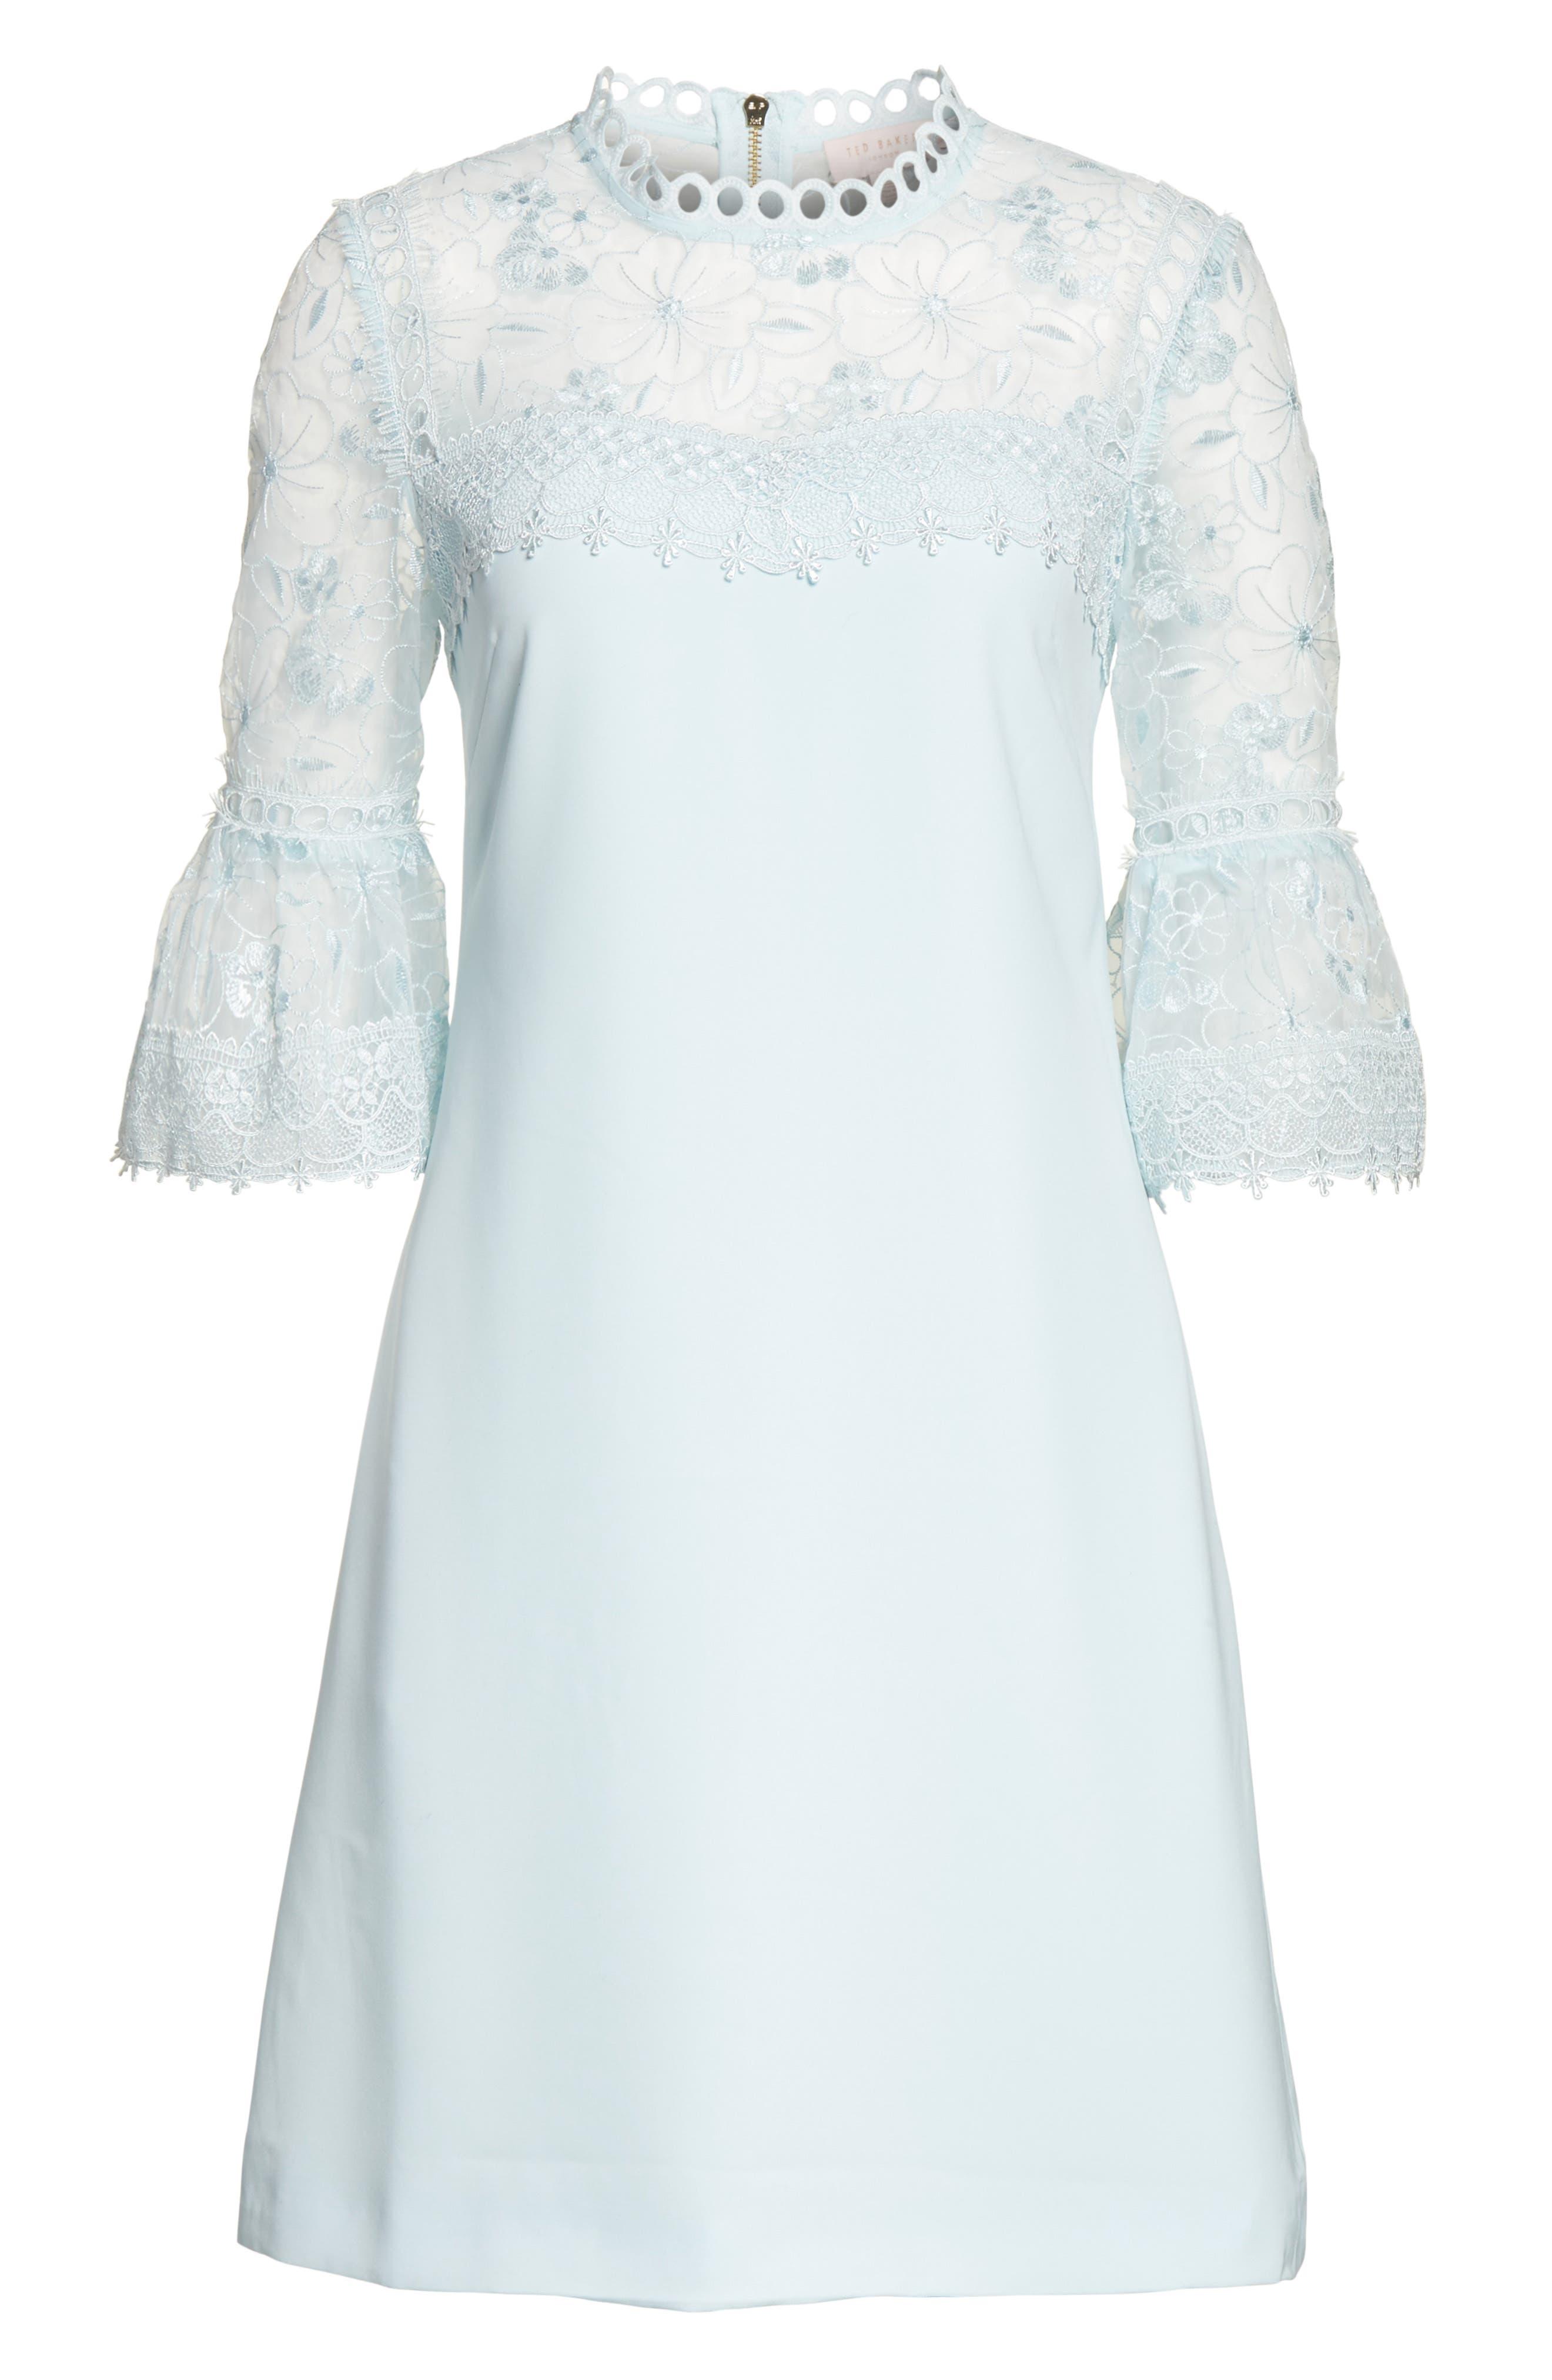 Raechal Lace Sleeve A-Line Dress,                             Alternate thumbnail 6, color,                             451